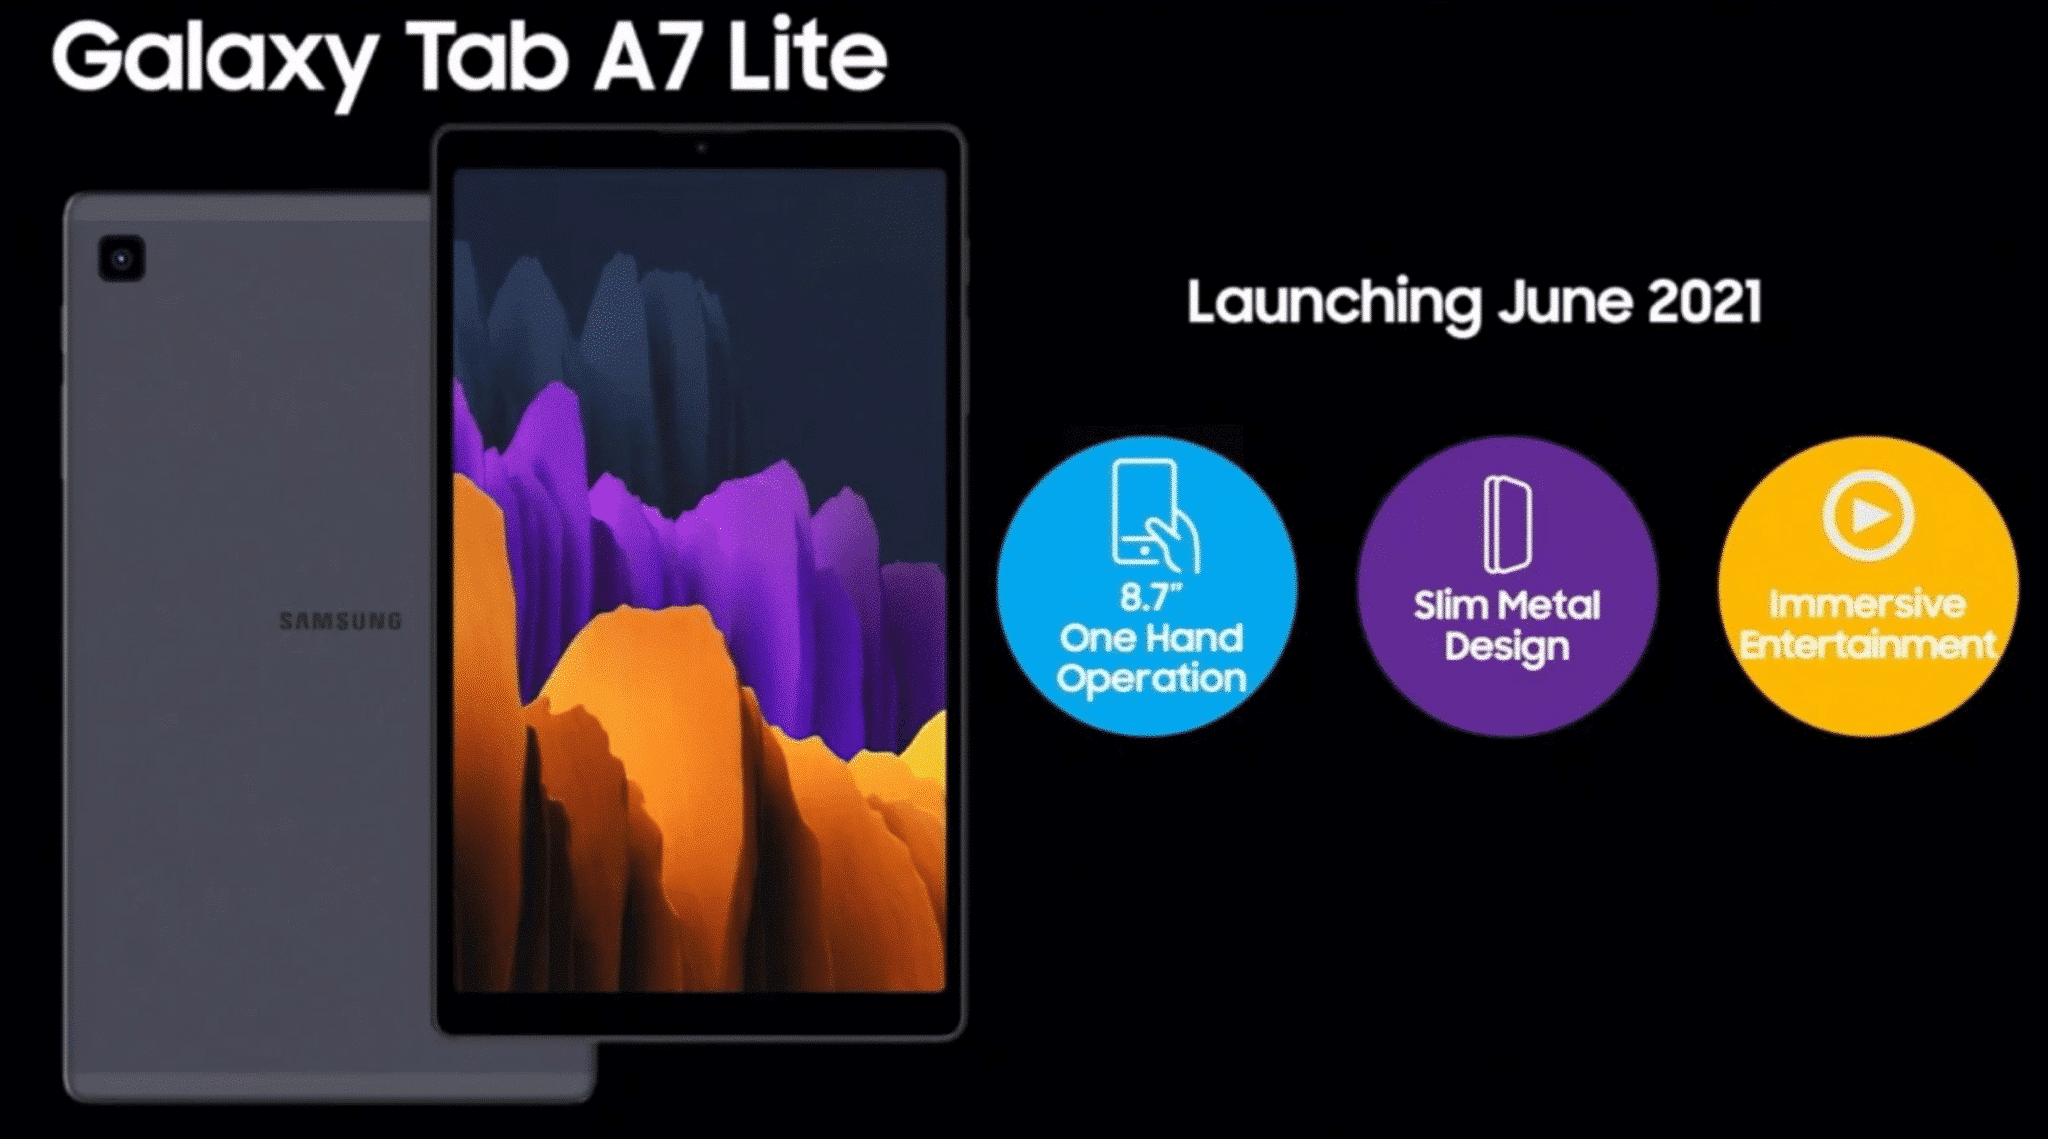 Samsung Galaxy Tab S7 Lite and Galaxy Tab A7 Lite specs leaked